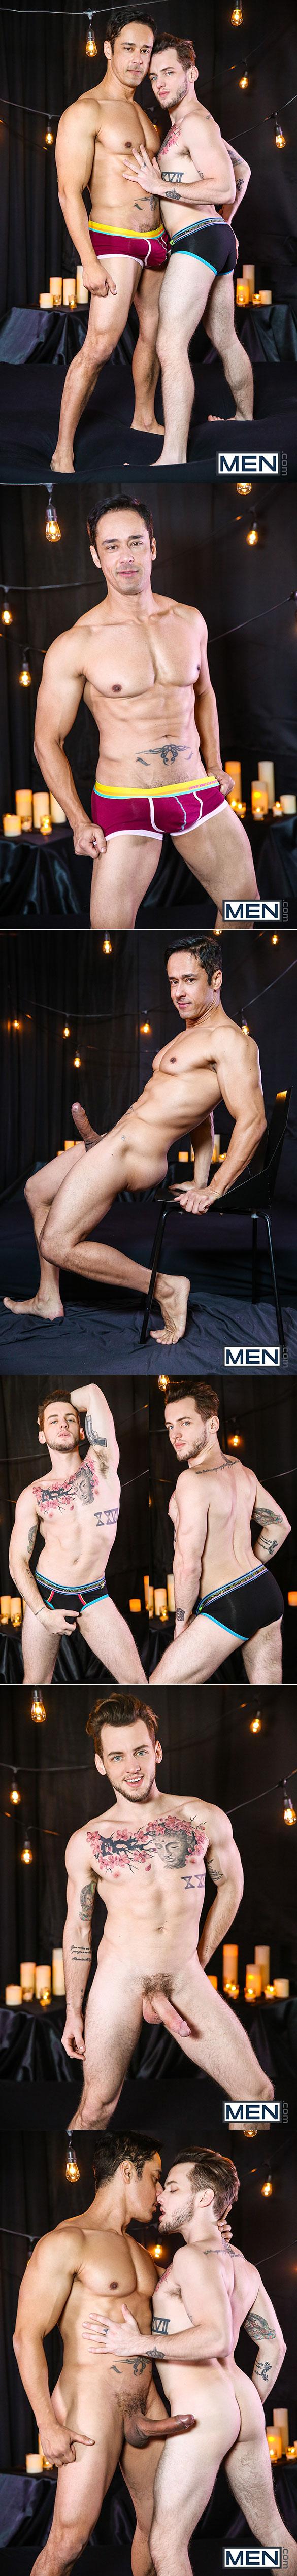 "Men.com: Colton Grey takes Rafael Alencar's big dick in ""Dirty Valentine, Part 4"""